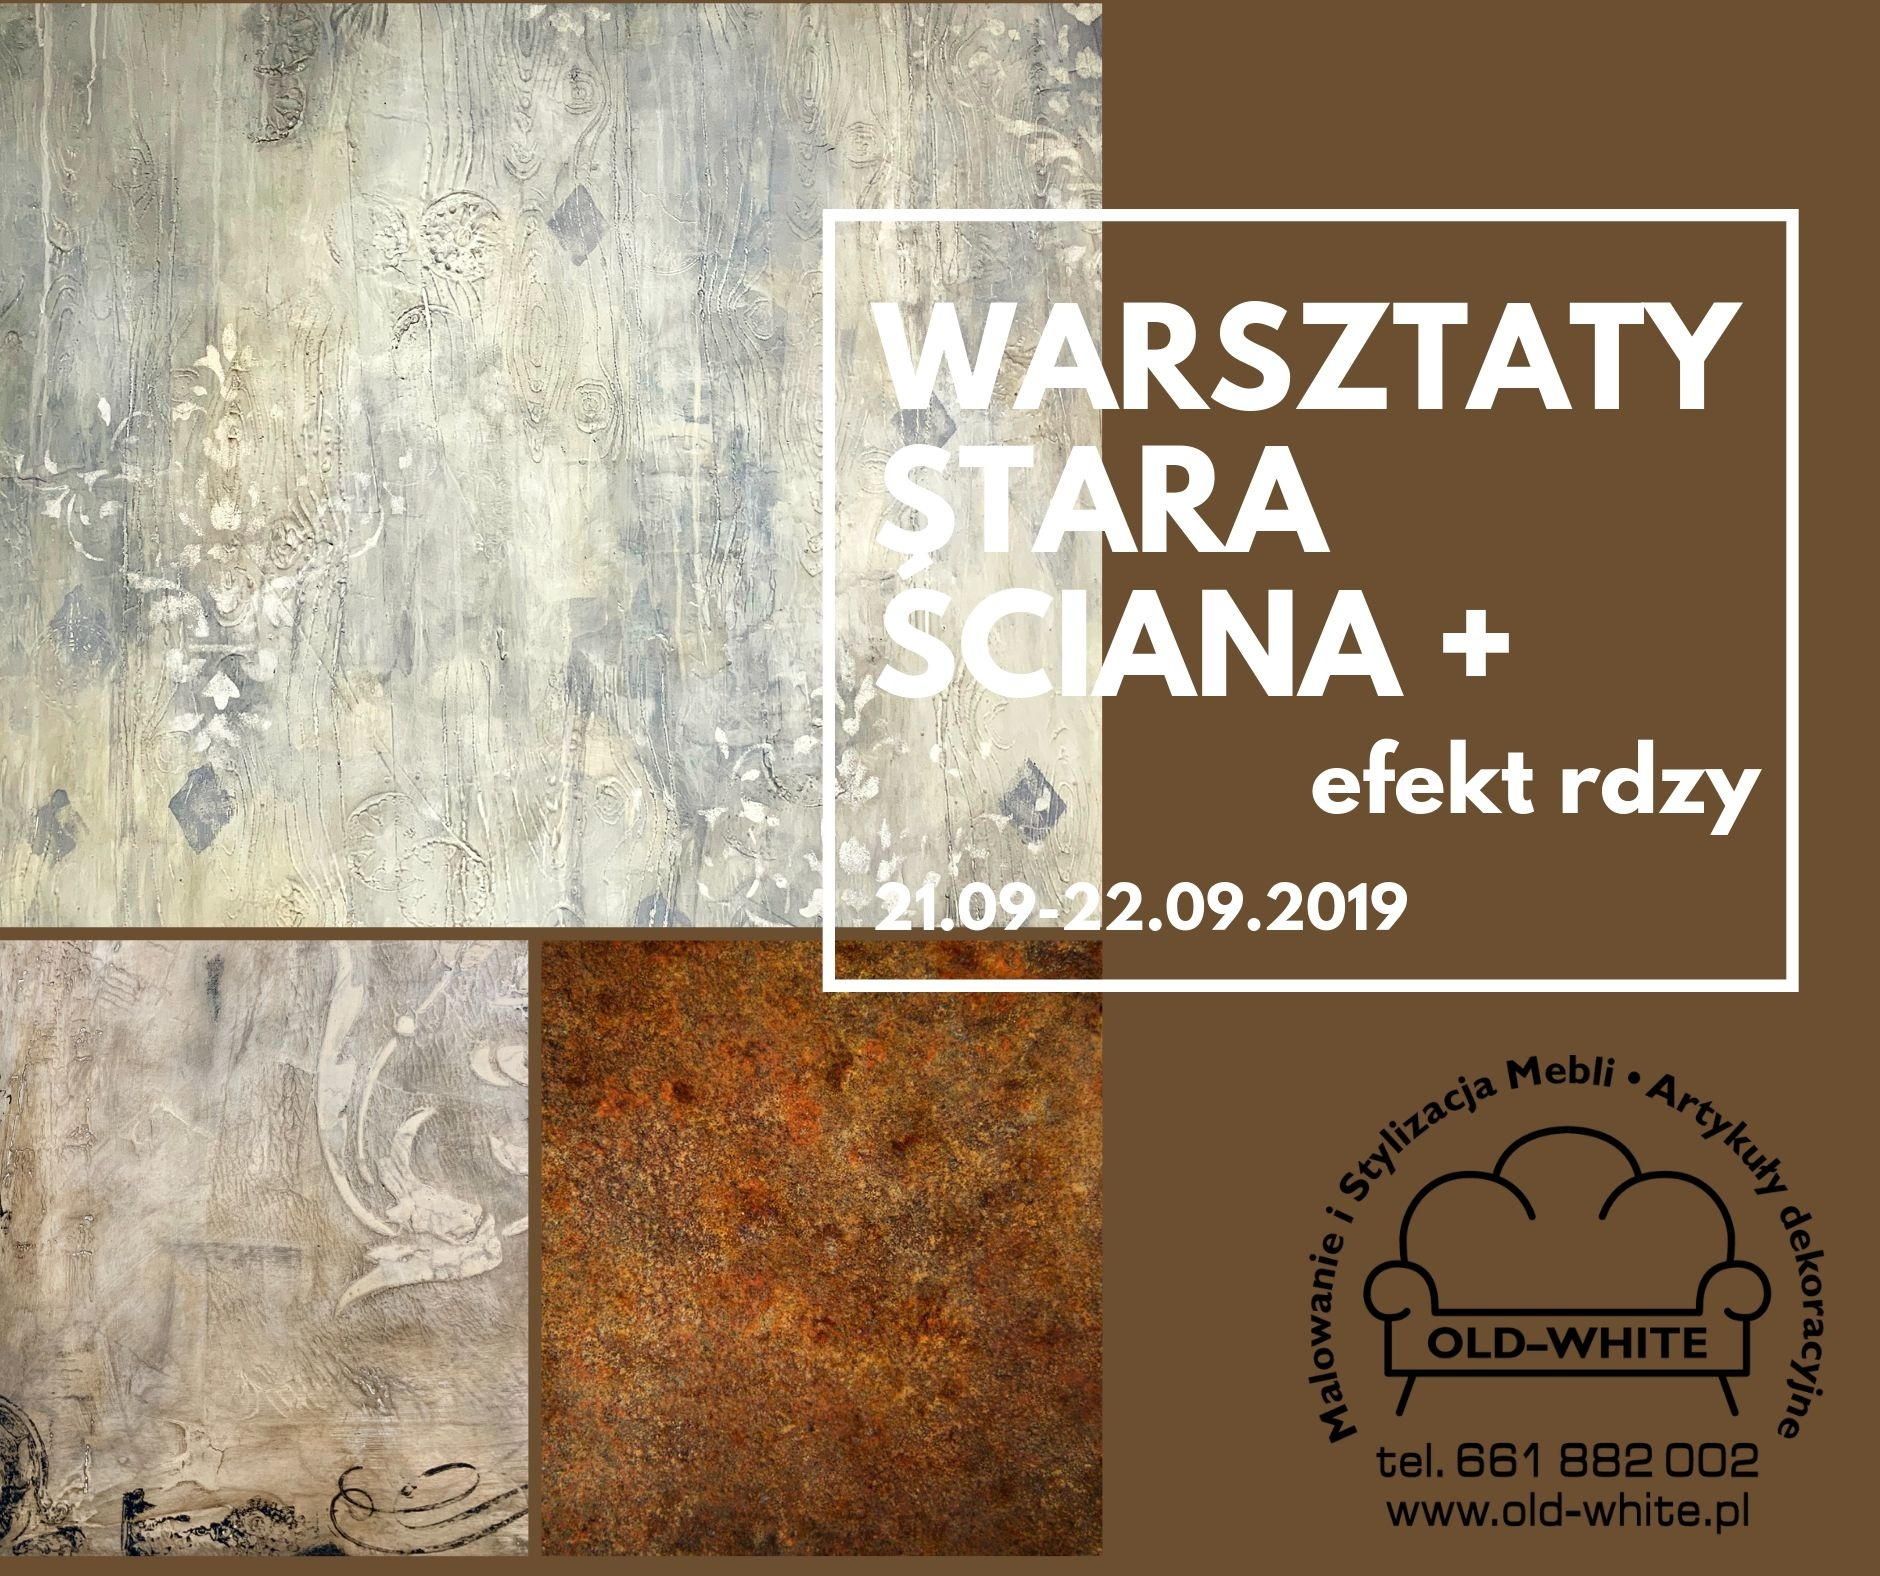 warsztaty_stara_ciana__obraz_1880